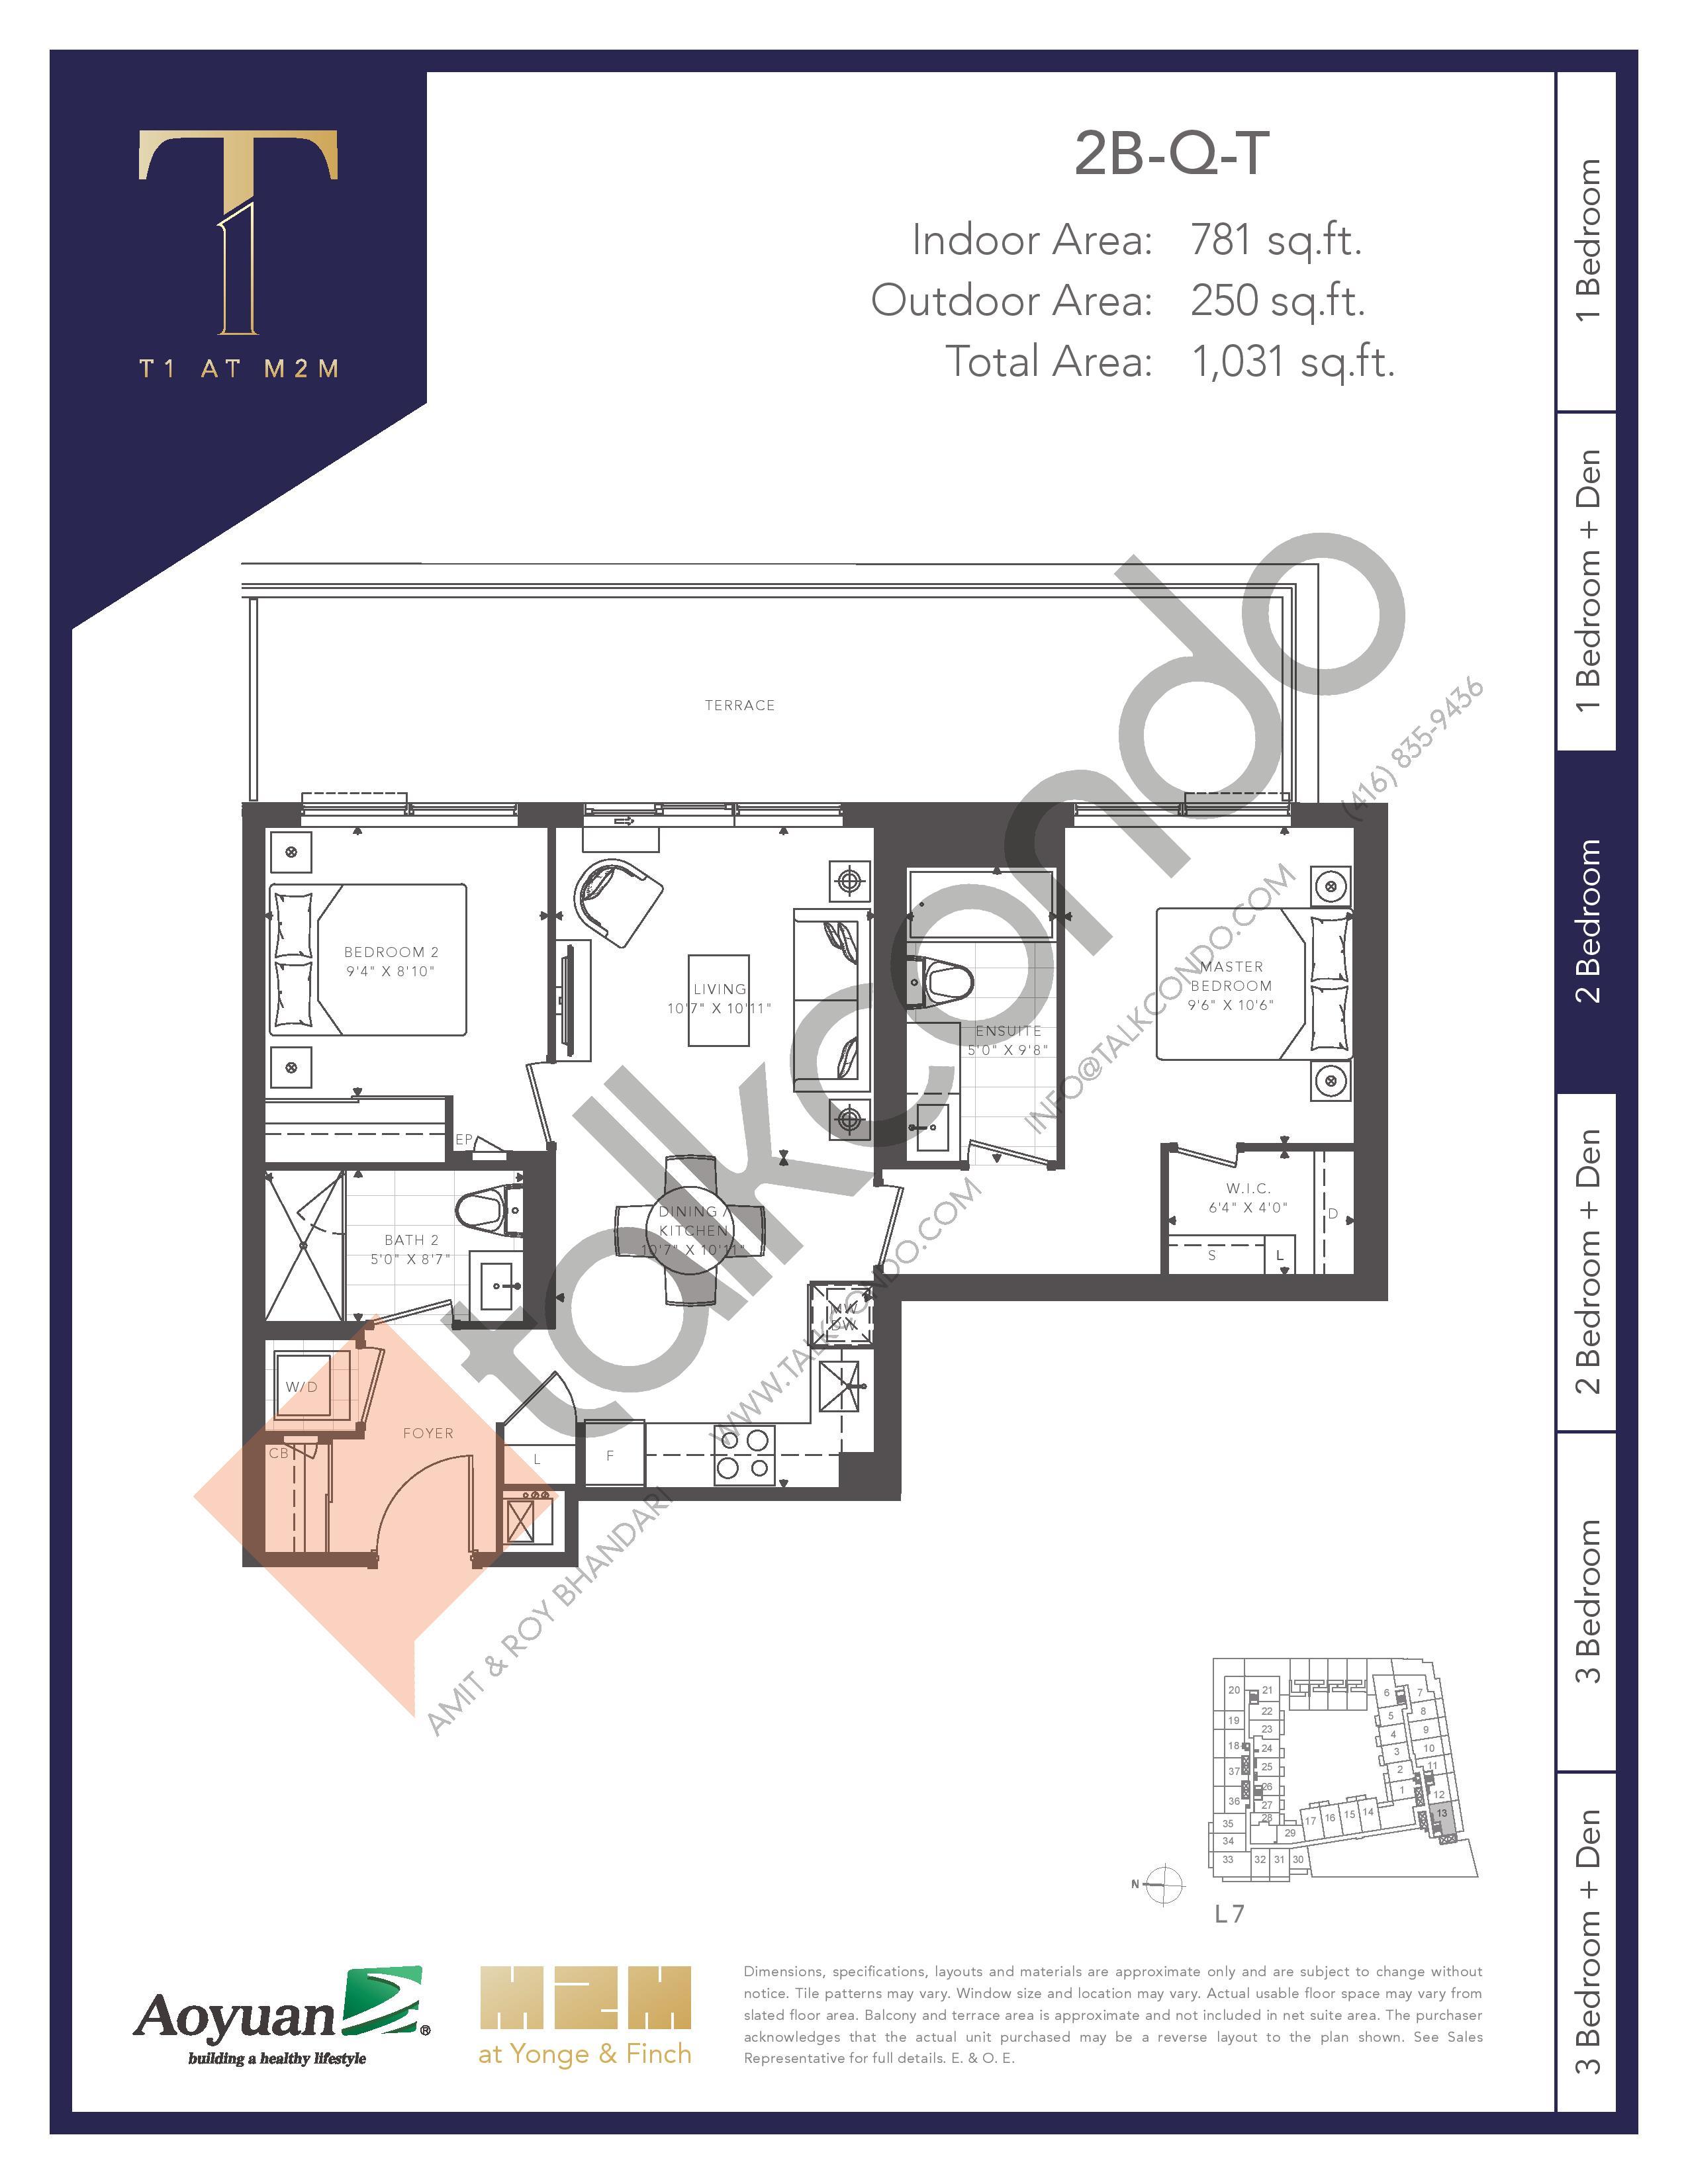 2B-Q-T (Tower) Floor Plan at T1 at M2M Condos - 781 sq.ft